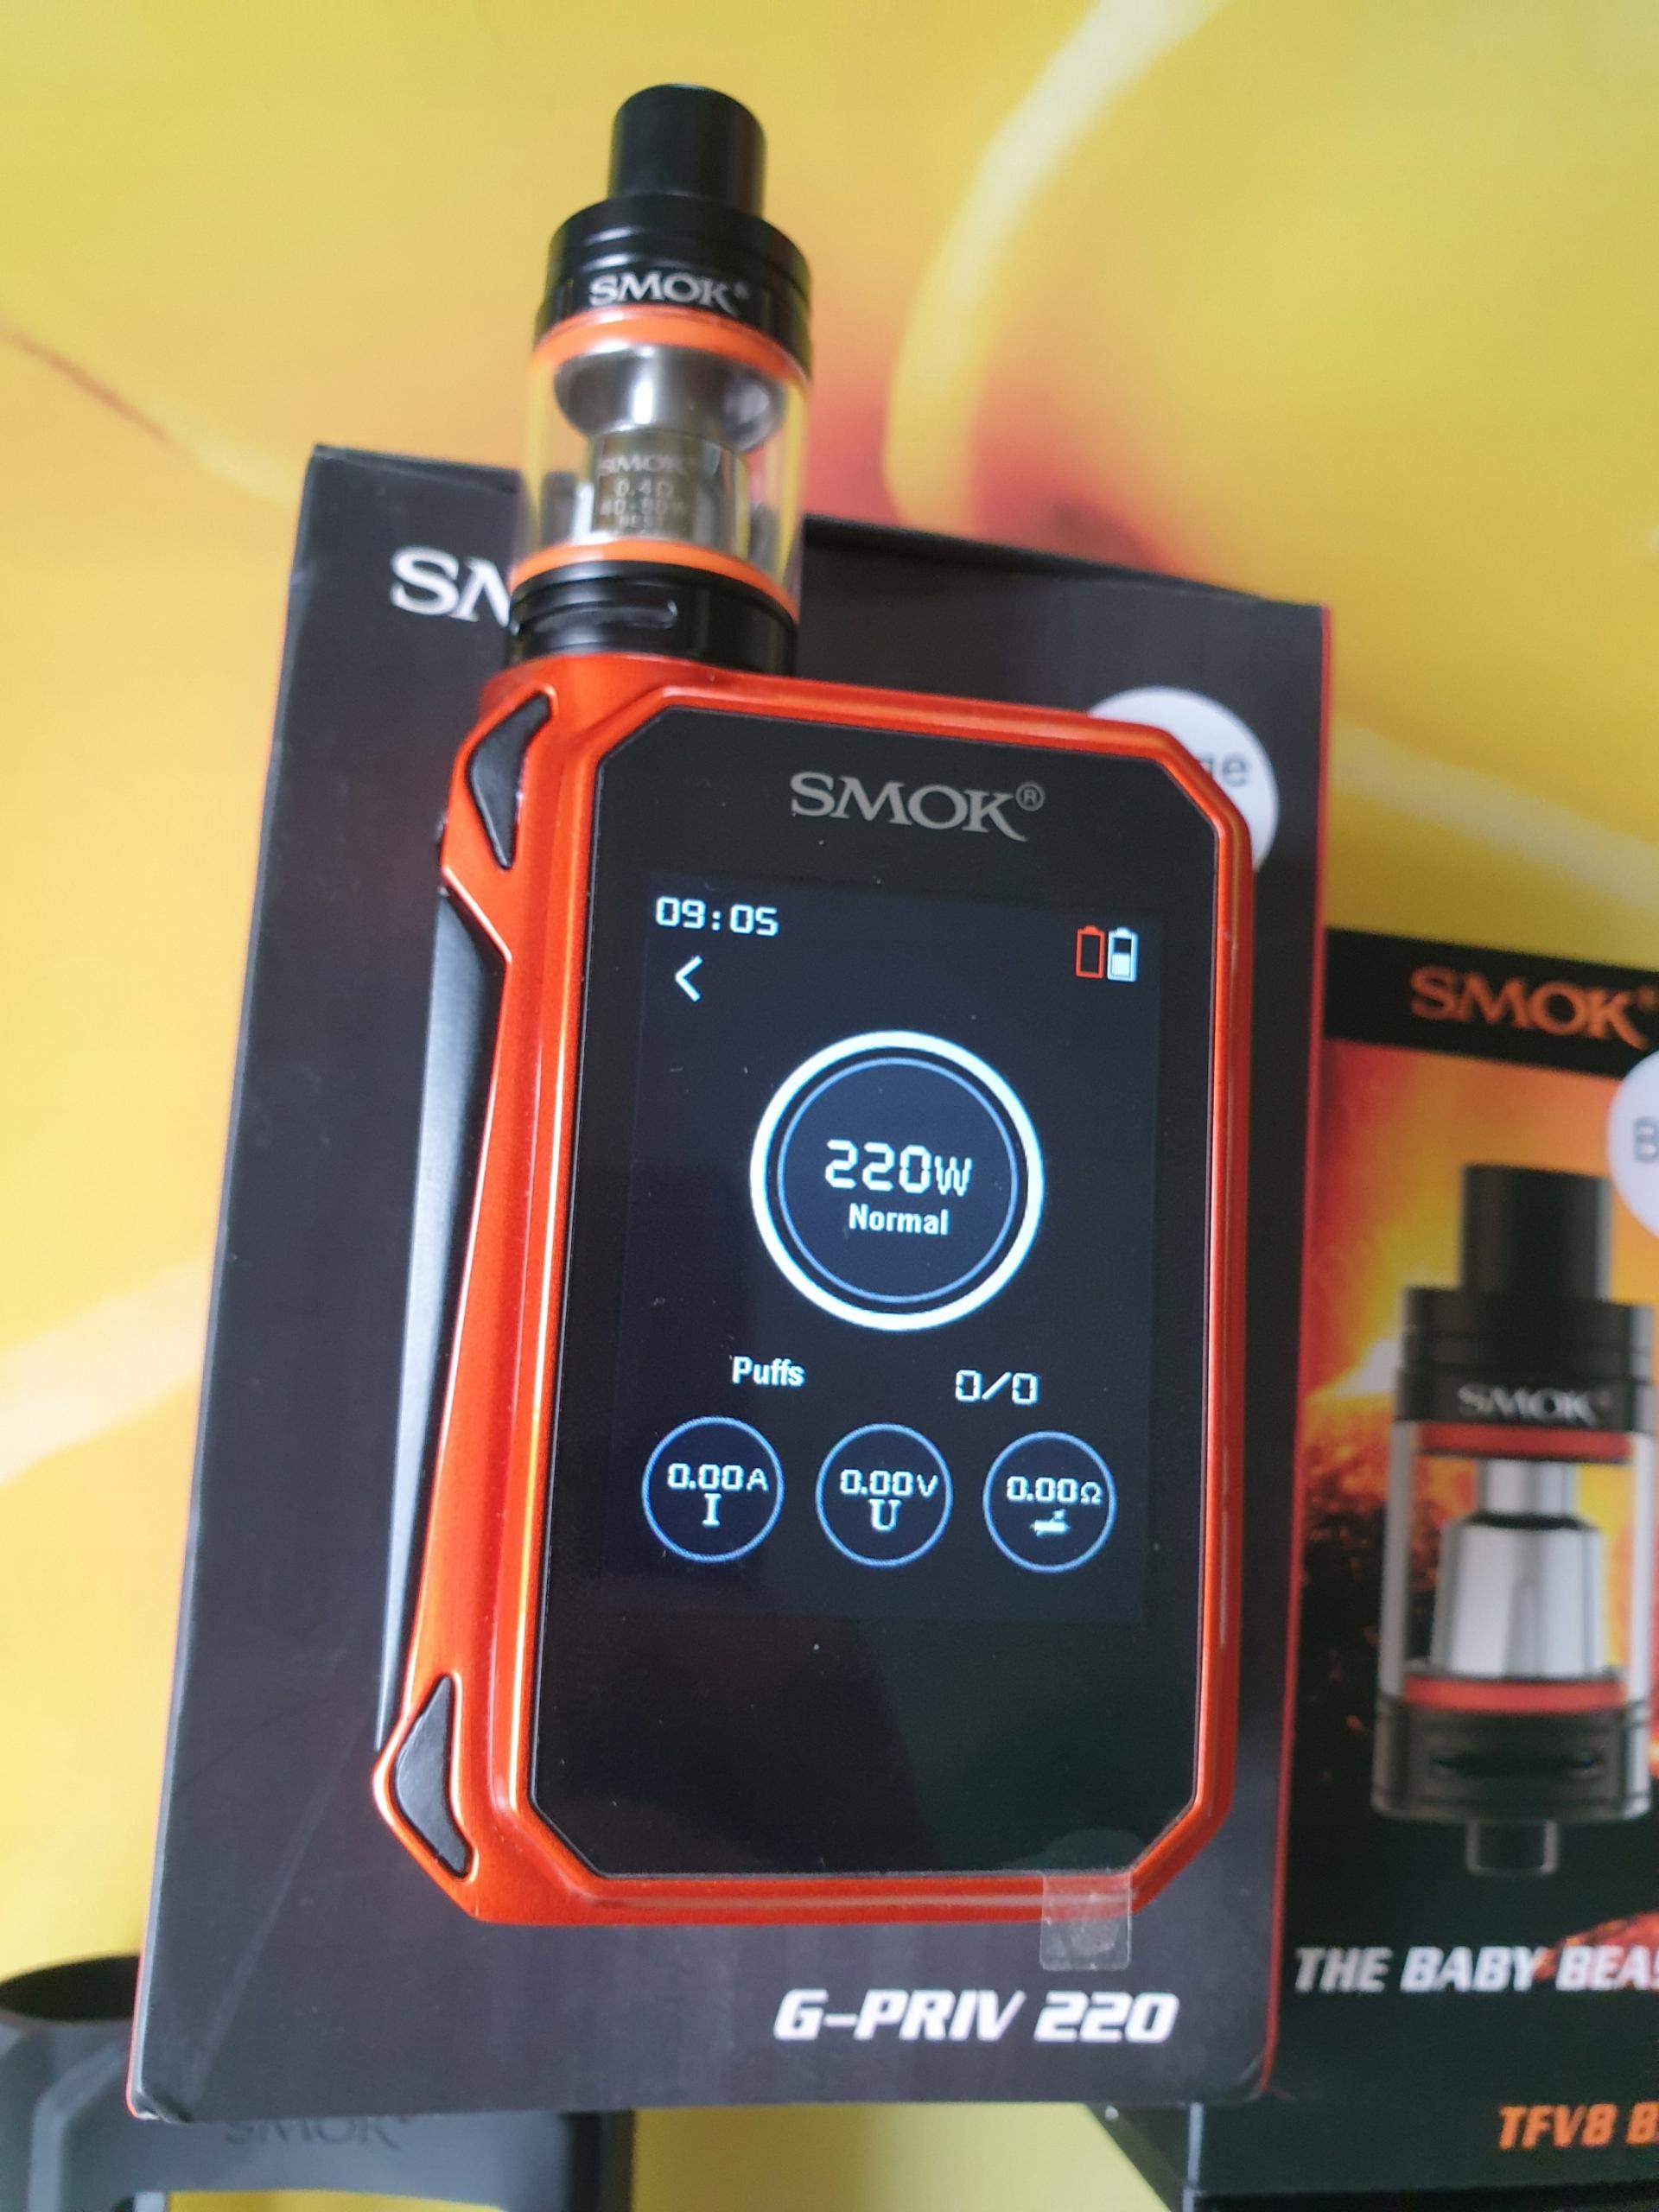 Box Smok G Priv 2 230w 7673218624 Oficjalne Archiwum Allegro